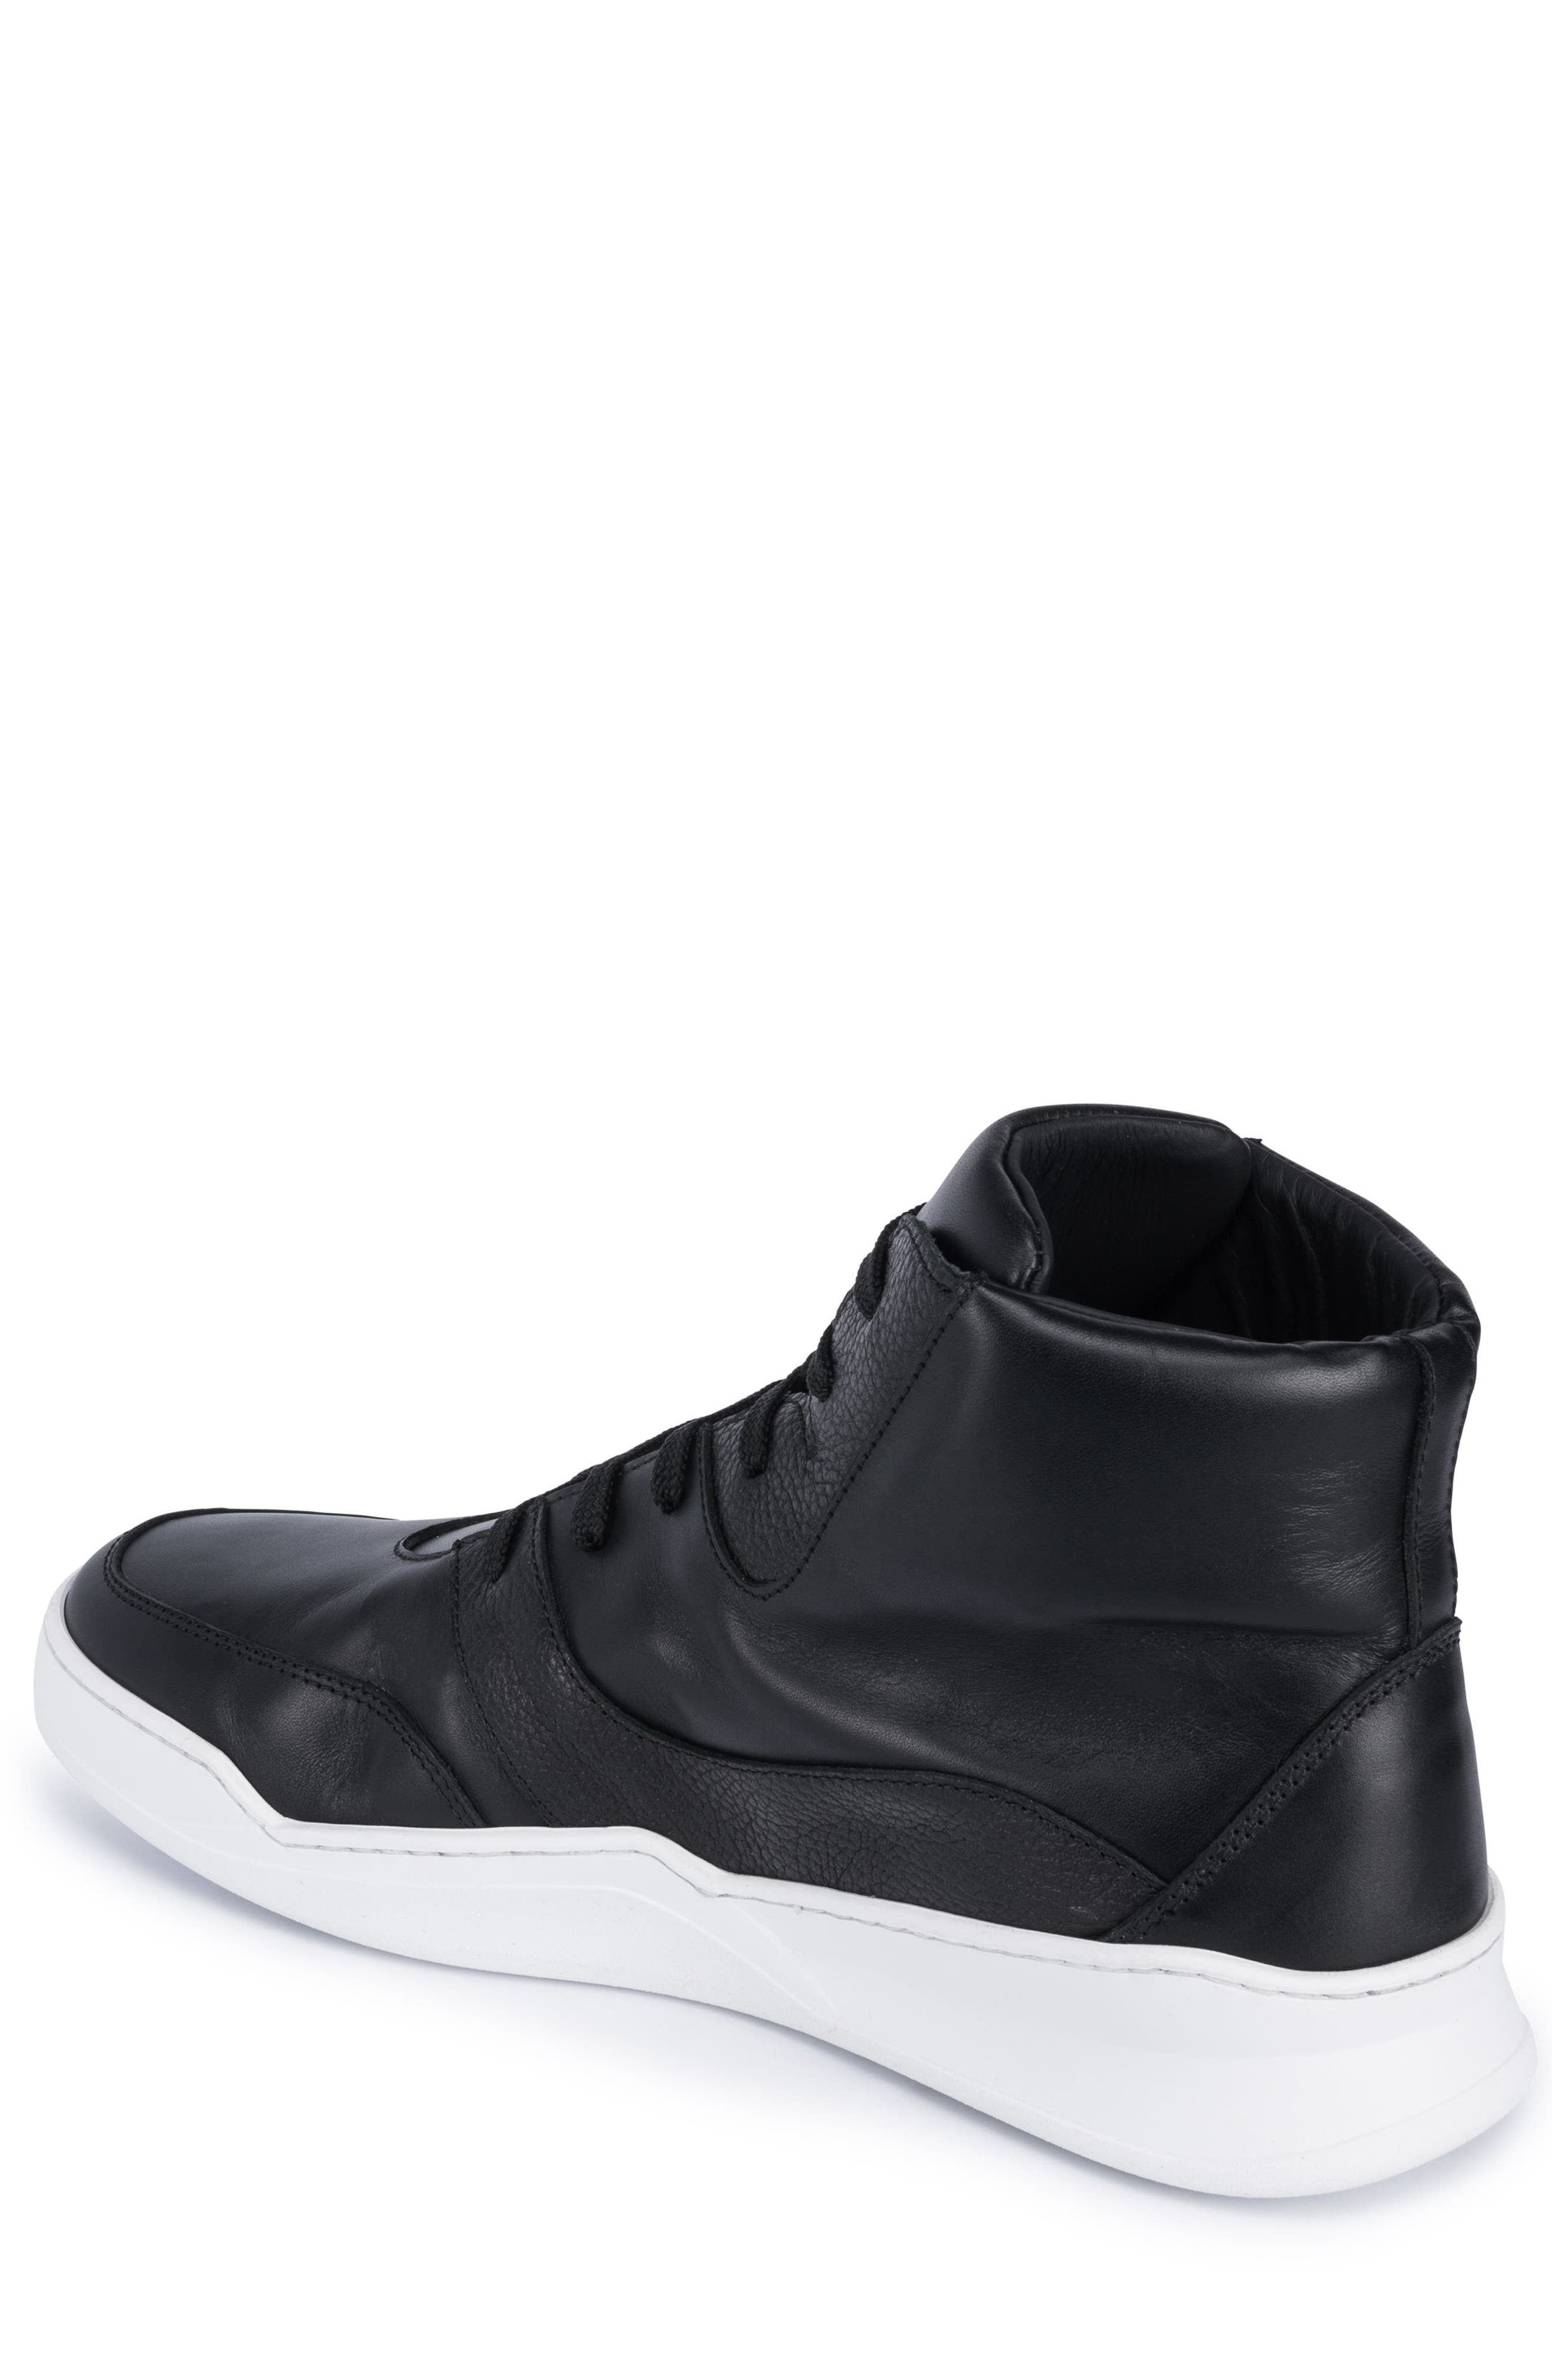 Carrara Sneaker,                             Alternate thumbnail 2, color,                             001